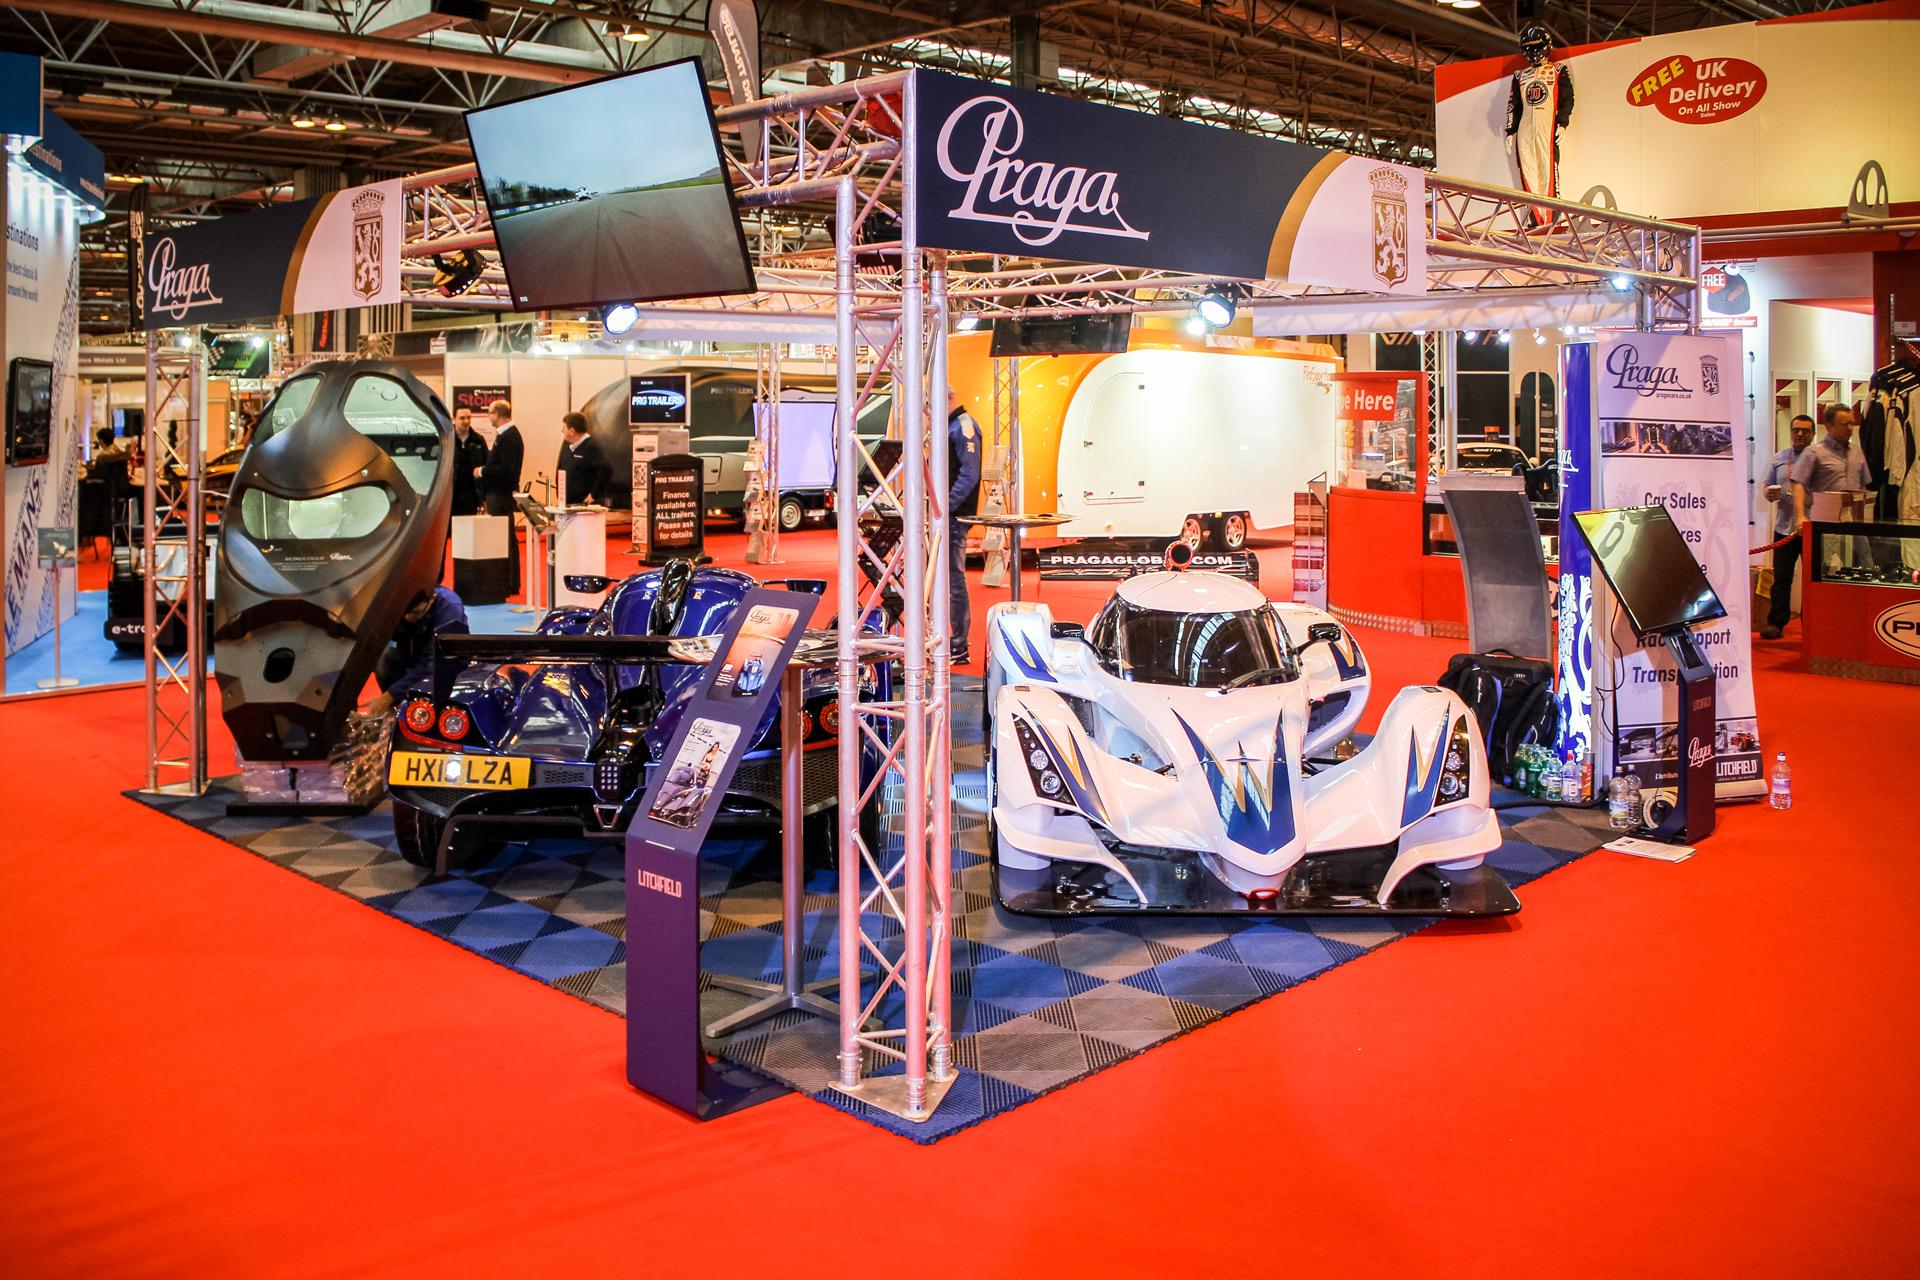 Praga Cars gathered crowds at Autosport show